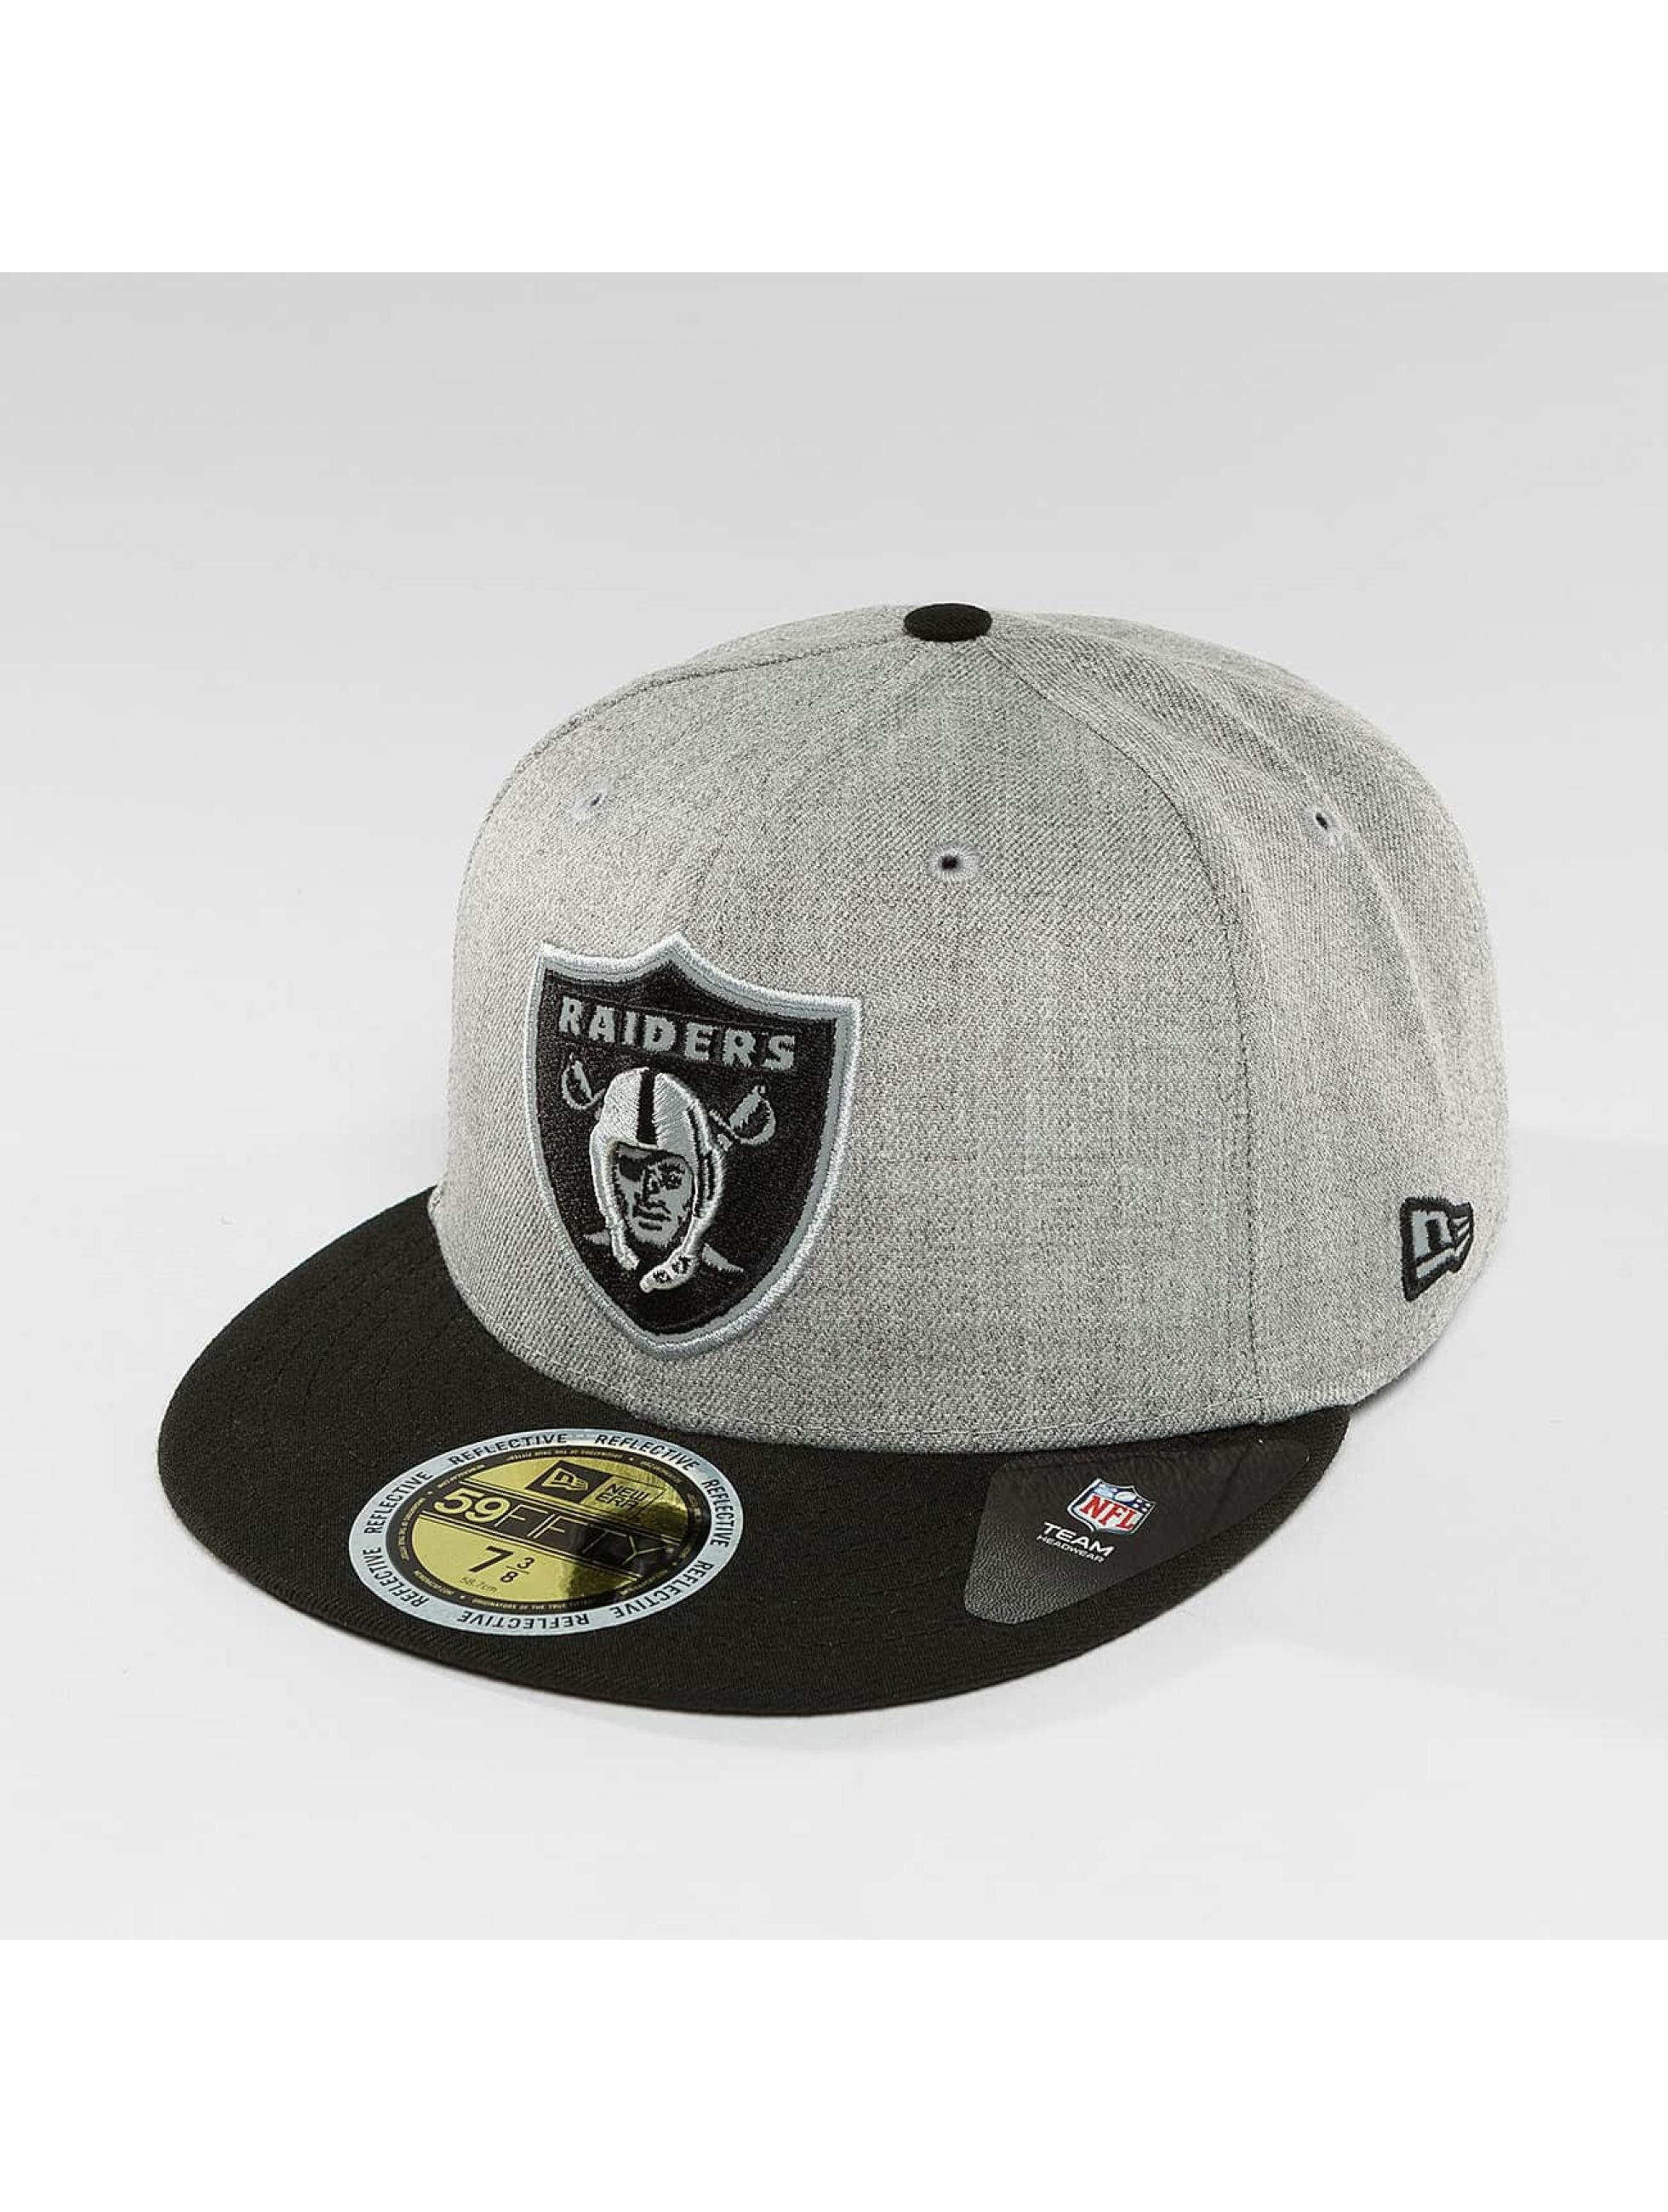 New Era Fitted Cap New Era Reflective Heather Oakland Raiders 59Fifty grijs